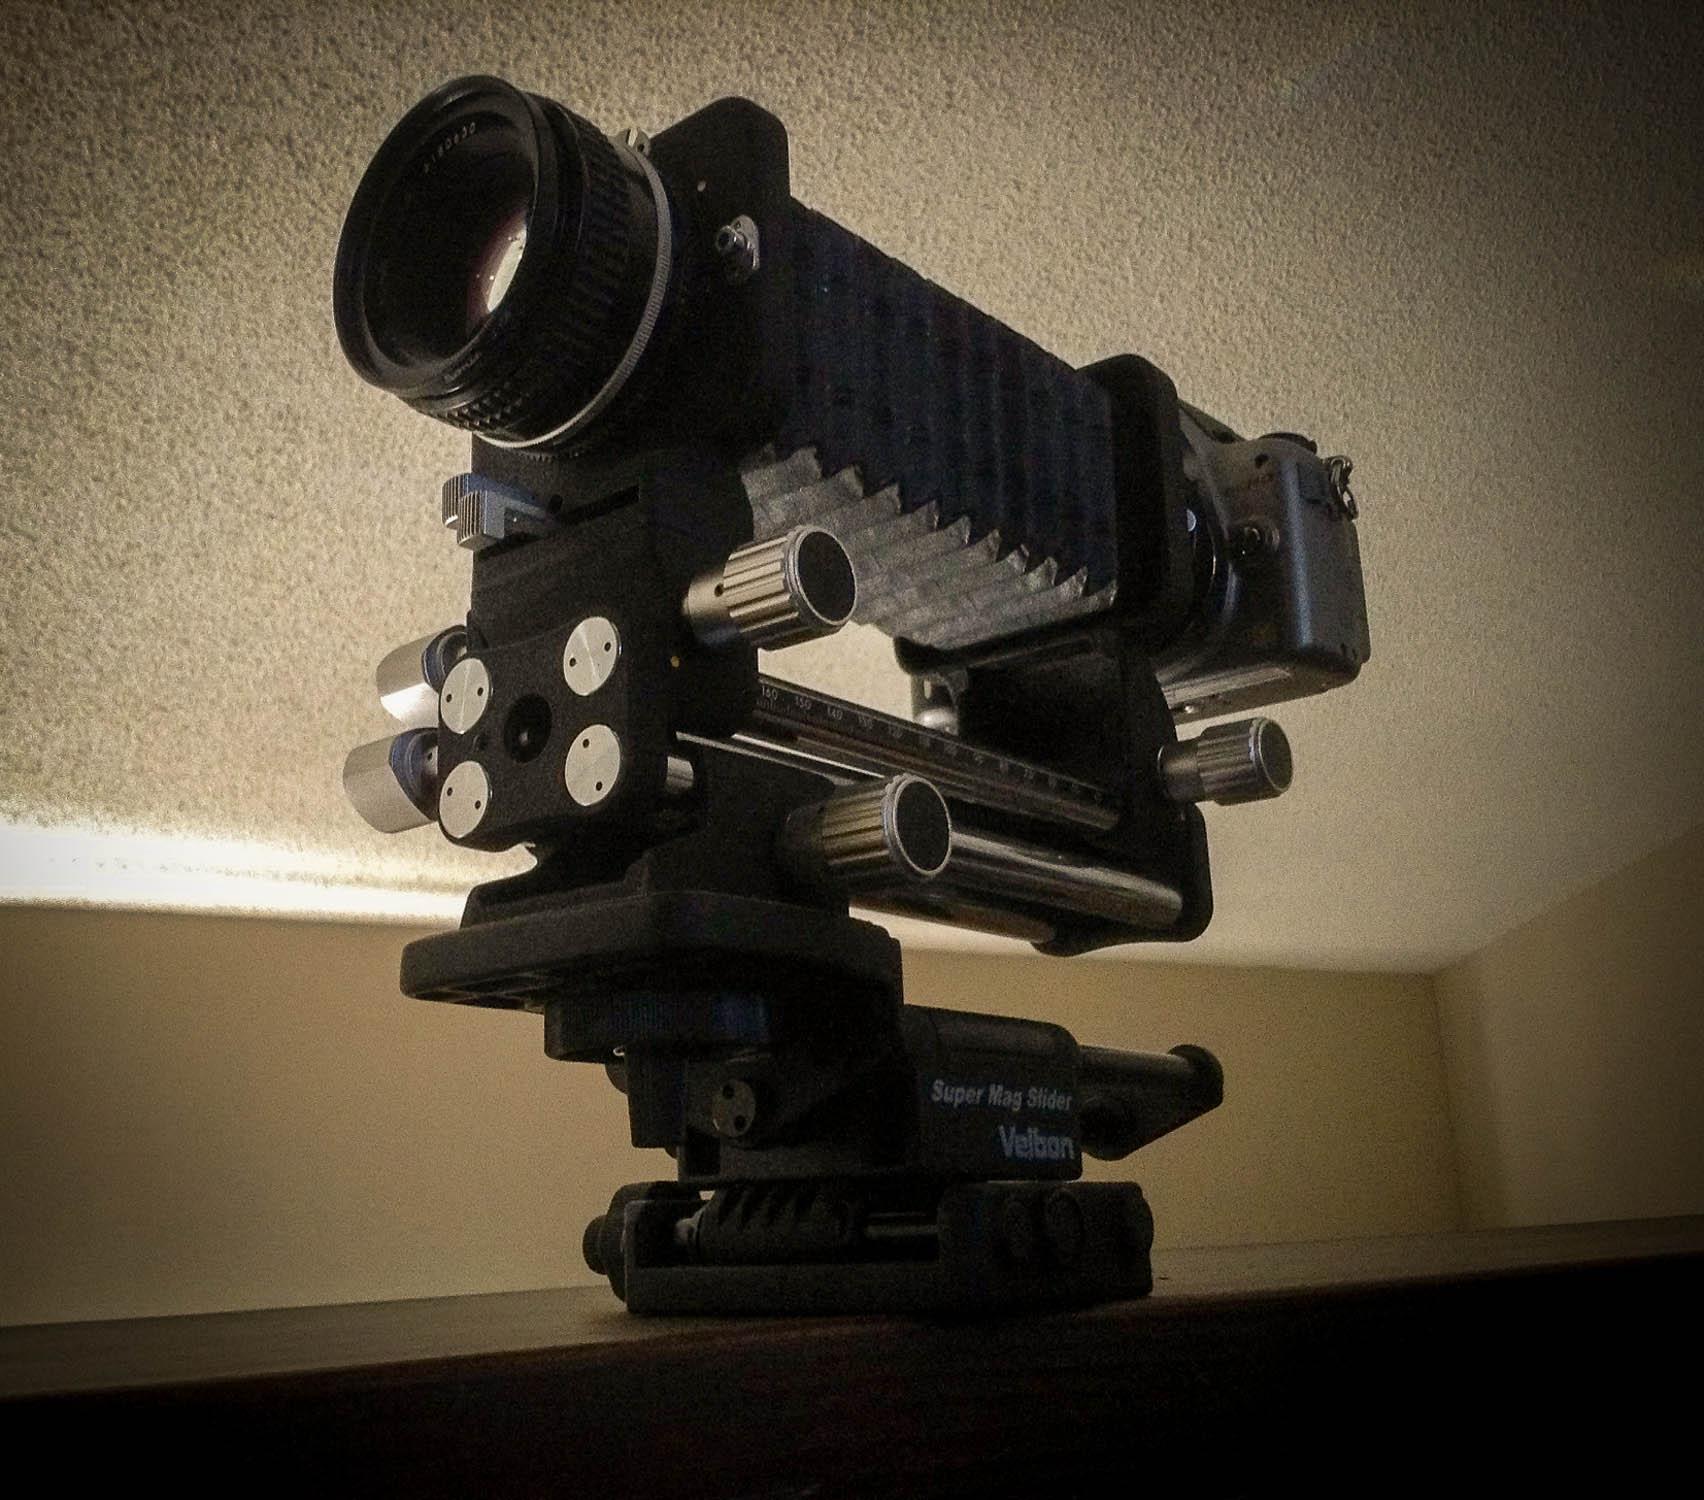 Nikon PB-4 Bellows mounted to my Pnasonic GH2